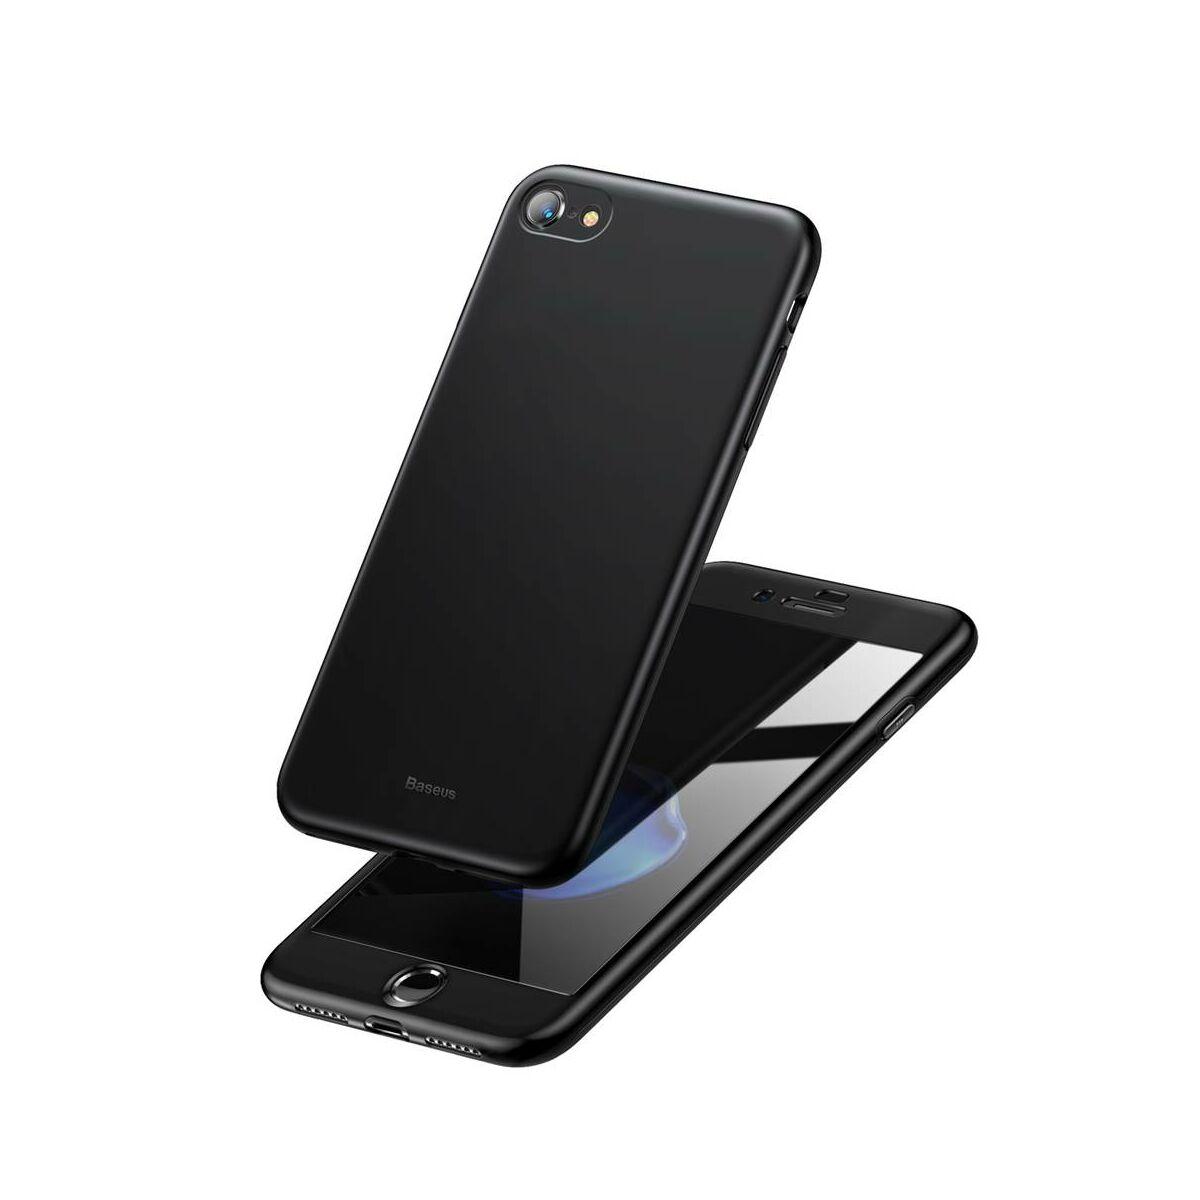 Baseus iPhone 8/7 tok, Fully védő, fekete (WIAPIPH8N-BA01)